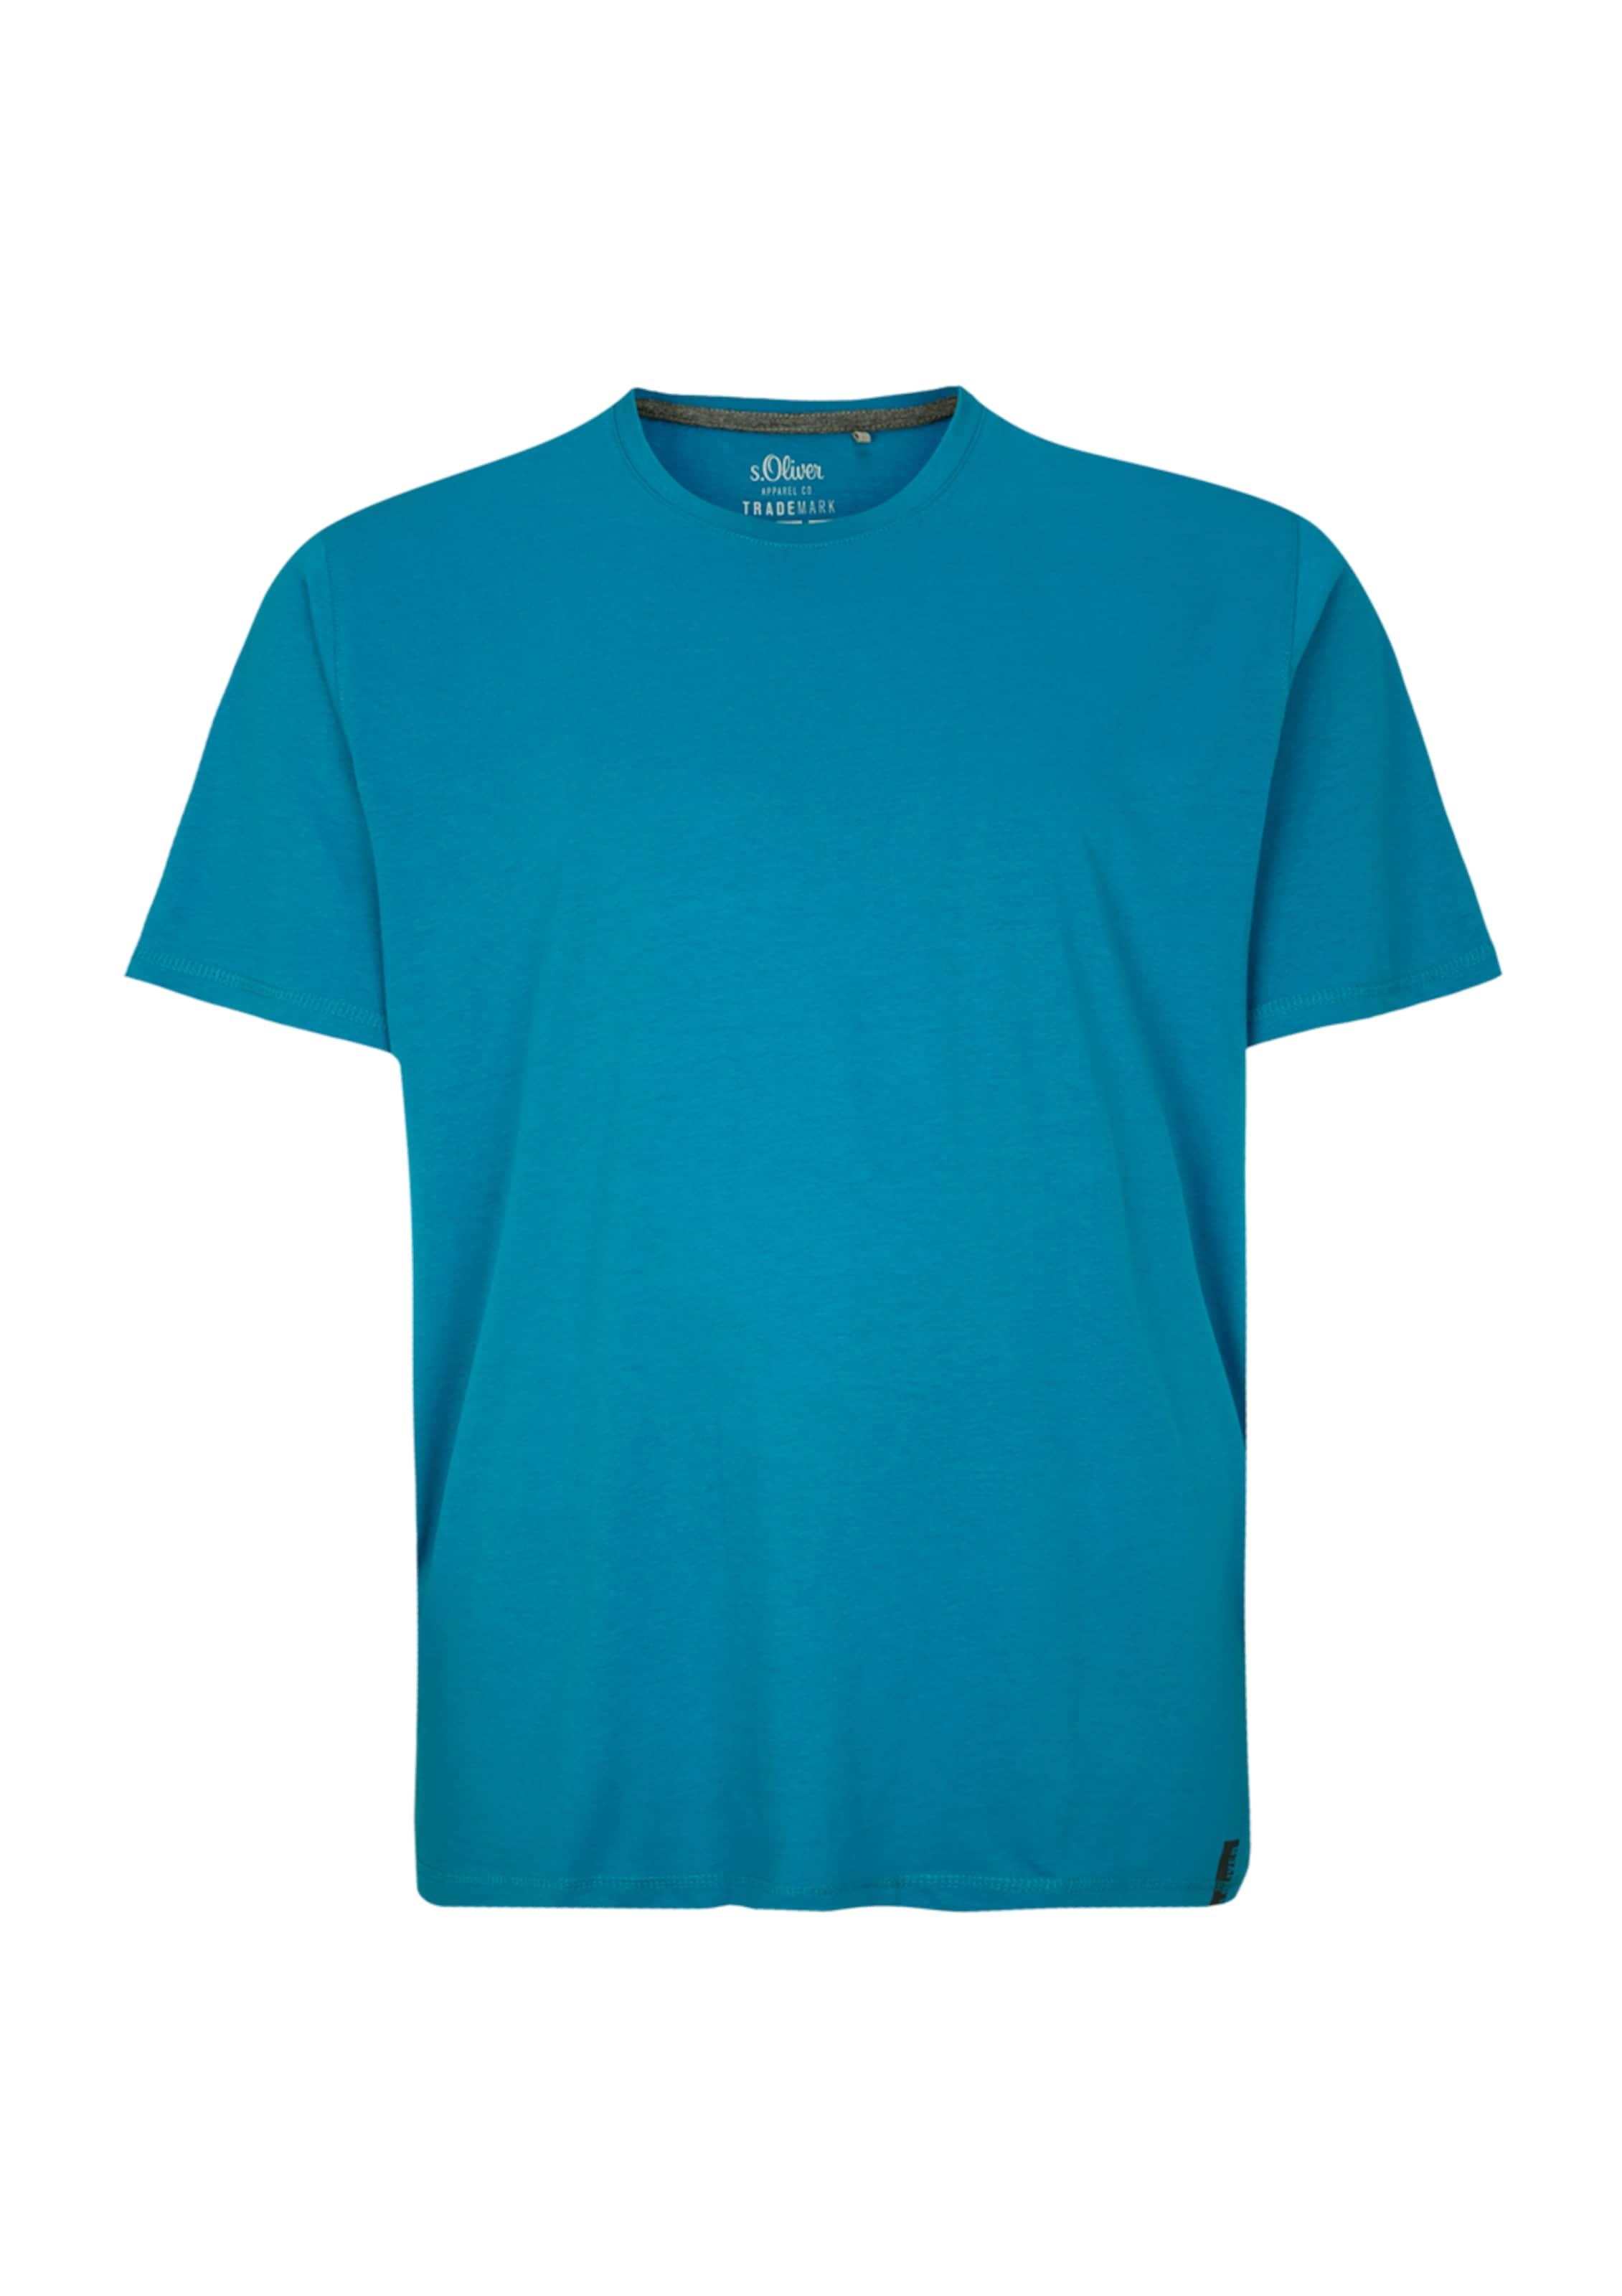 Label In Himmelblau Red Shirt oliver S PNOZn0kX8w